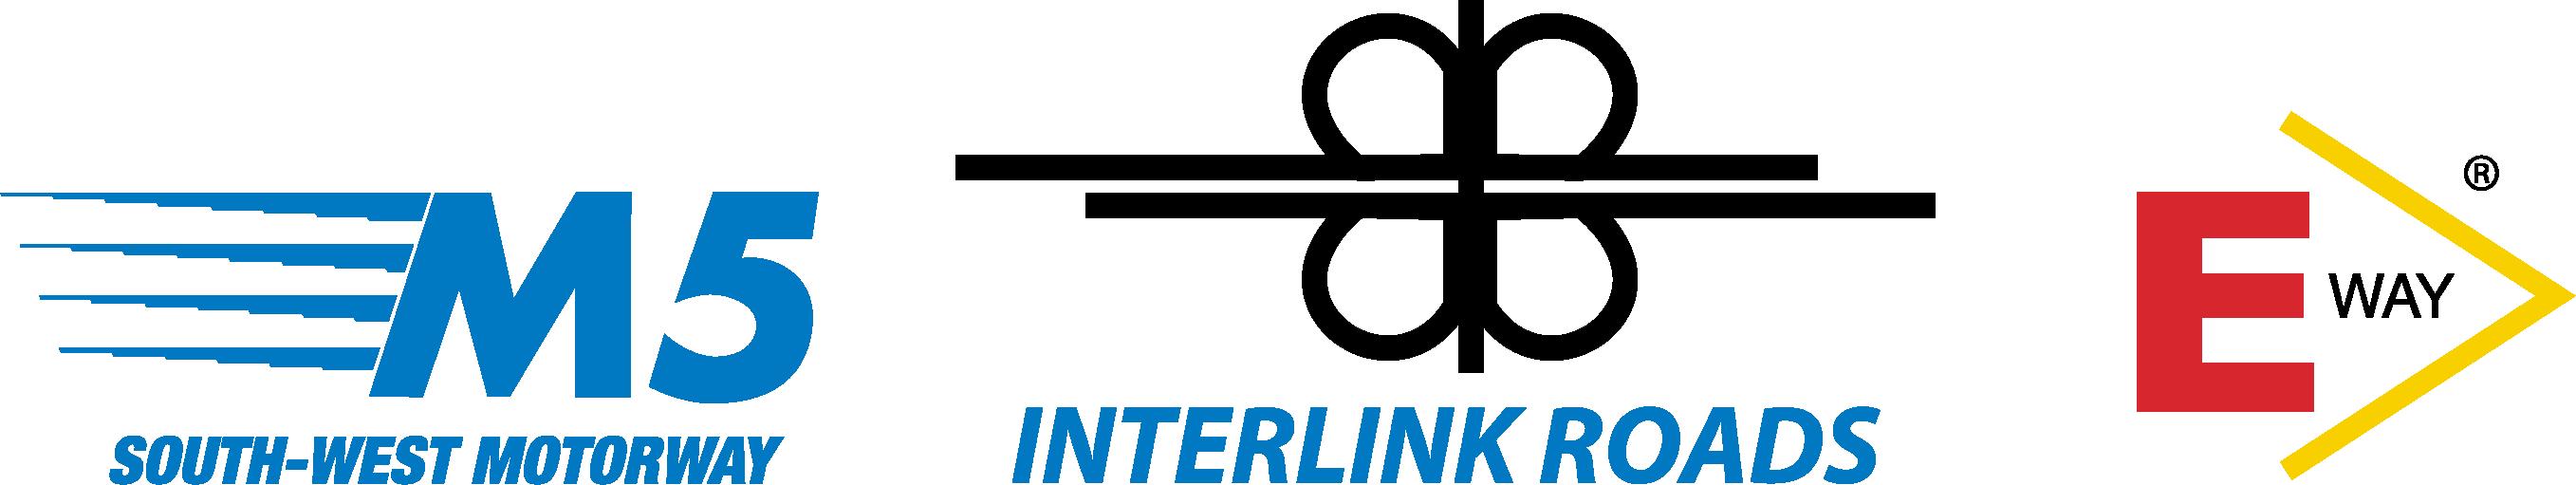 Interlink Roads